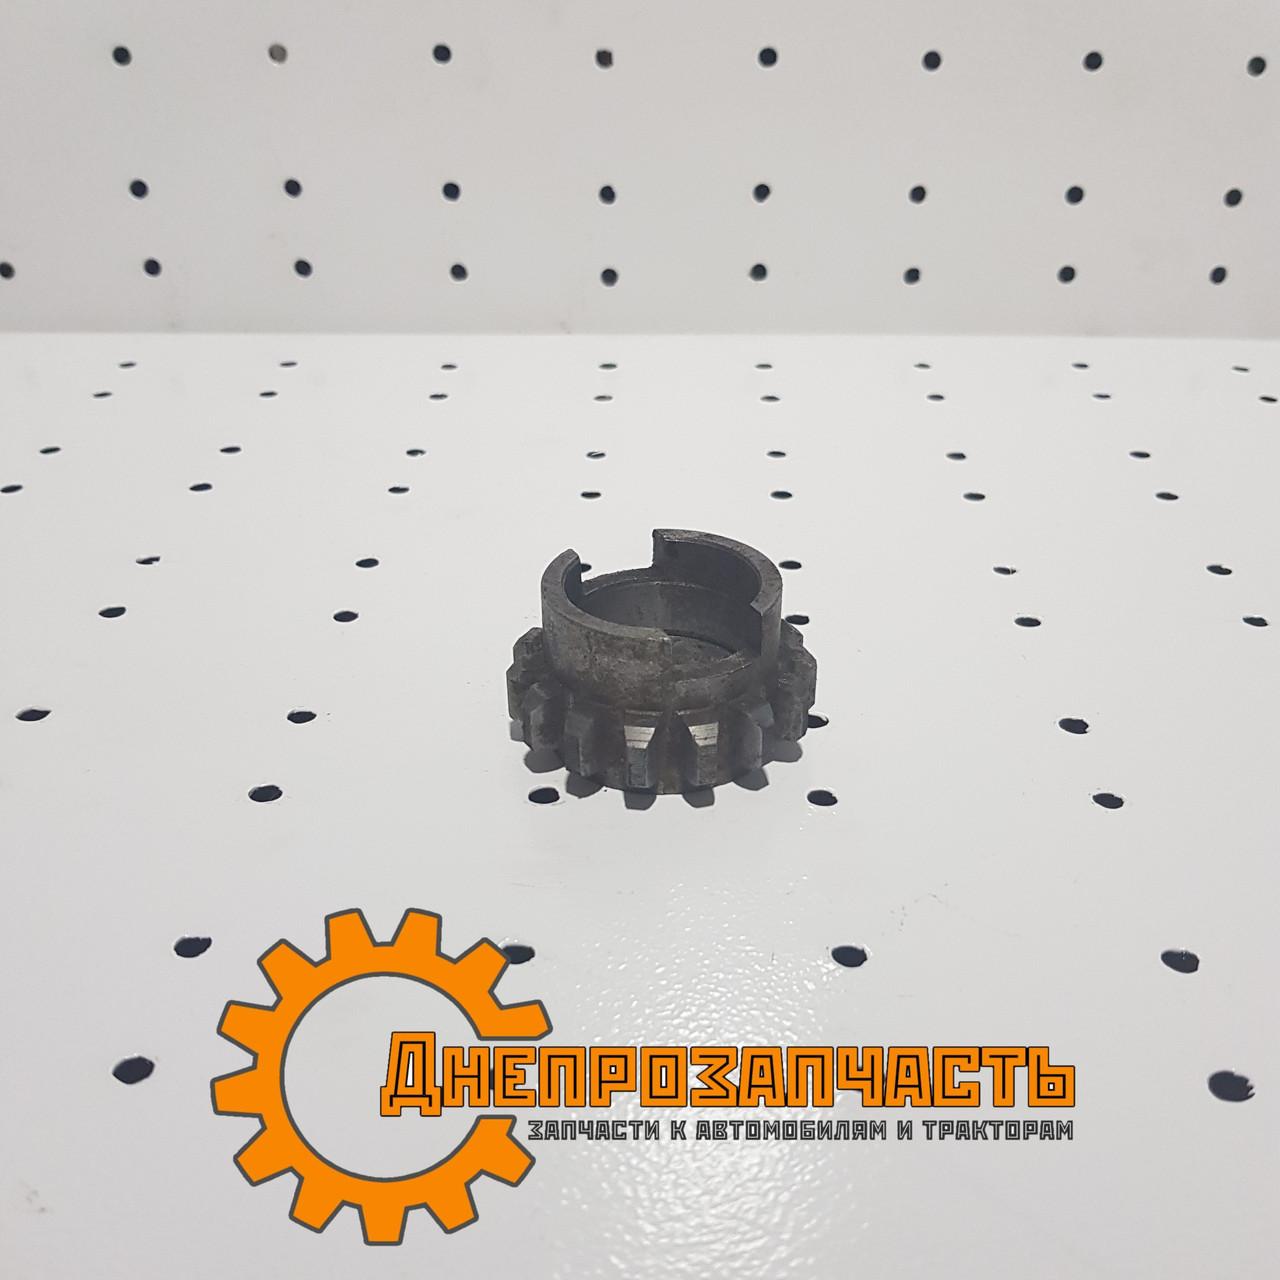 Шестерня привода магнето ПД-10